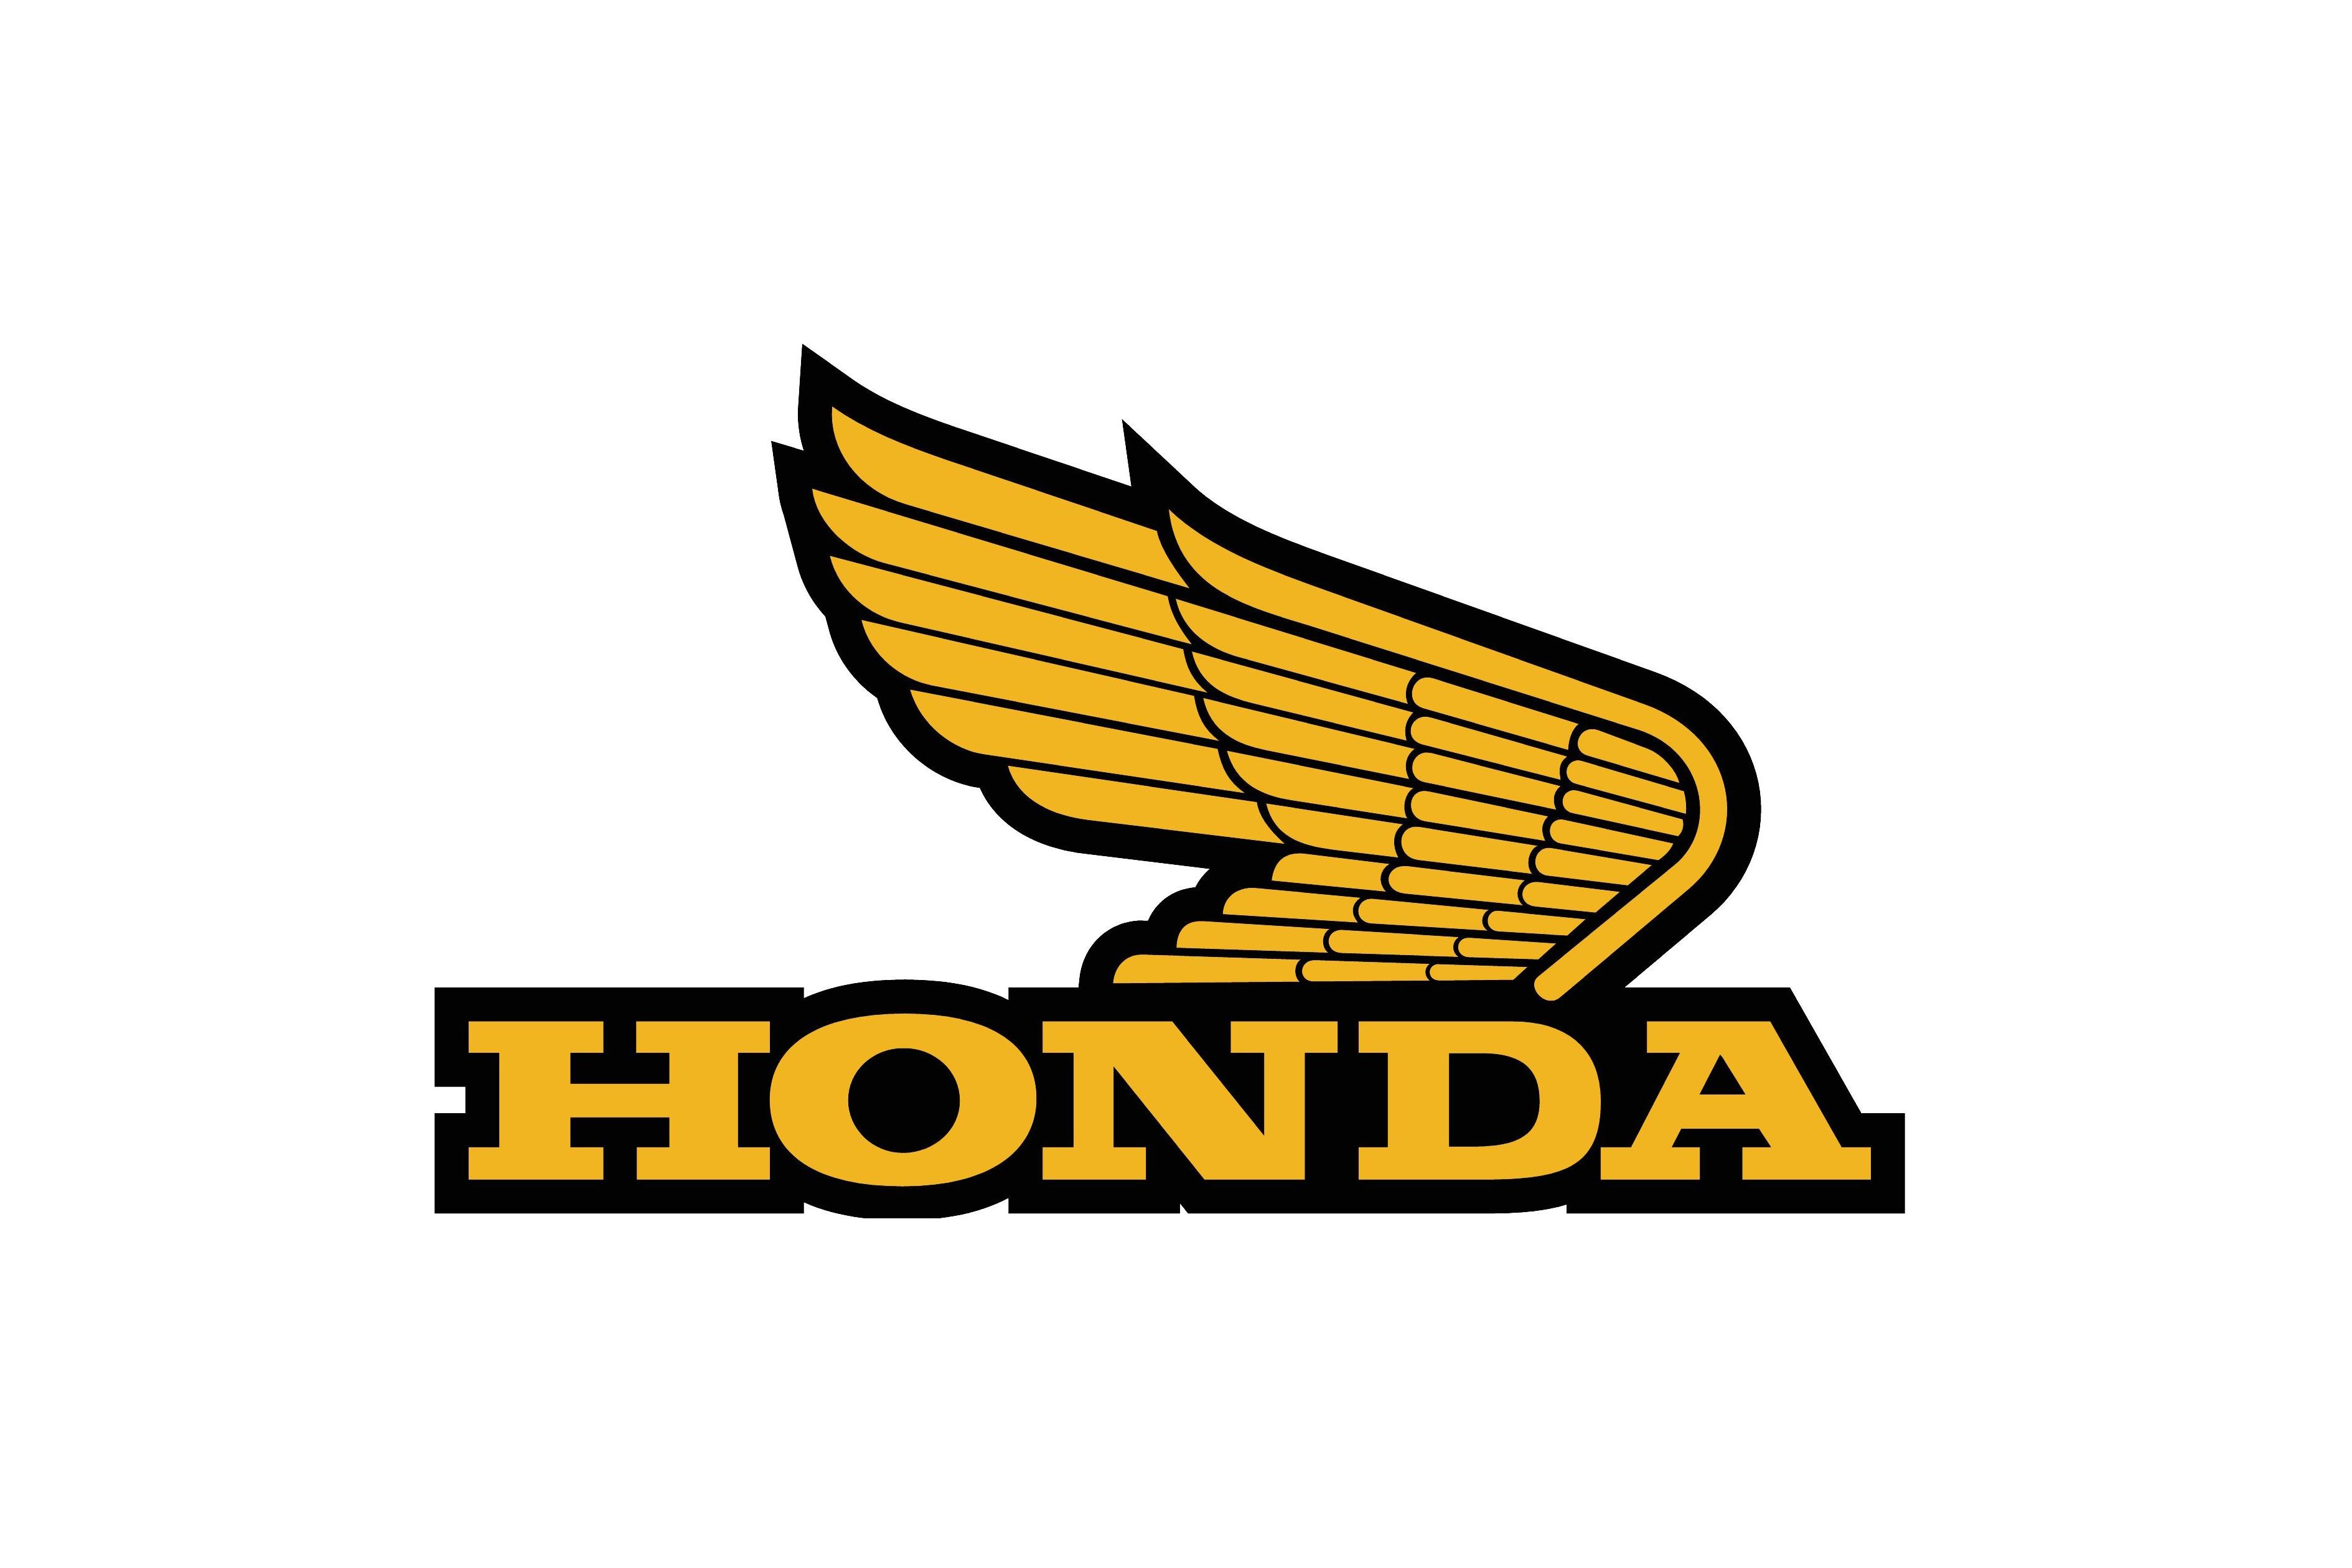 honda goldwing logo | hobbiesxstyle Honda Motorcycle Logo Vector